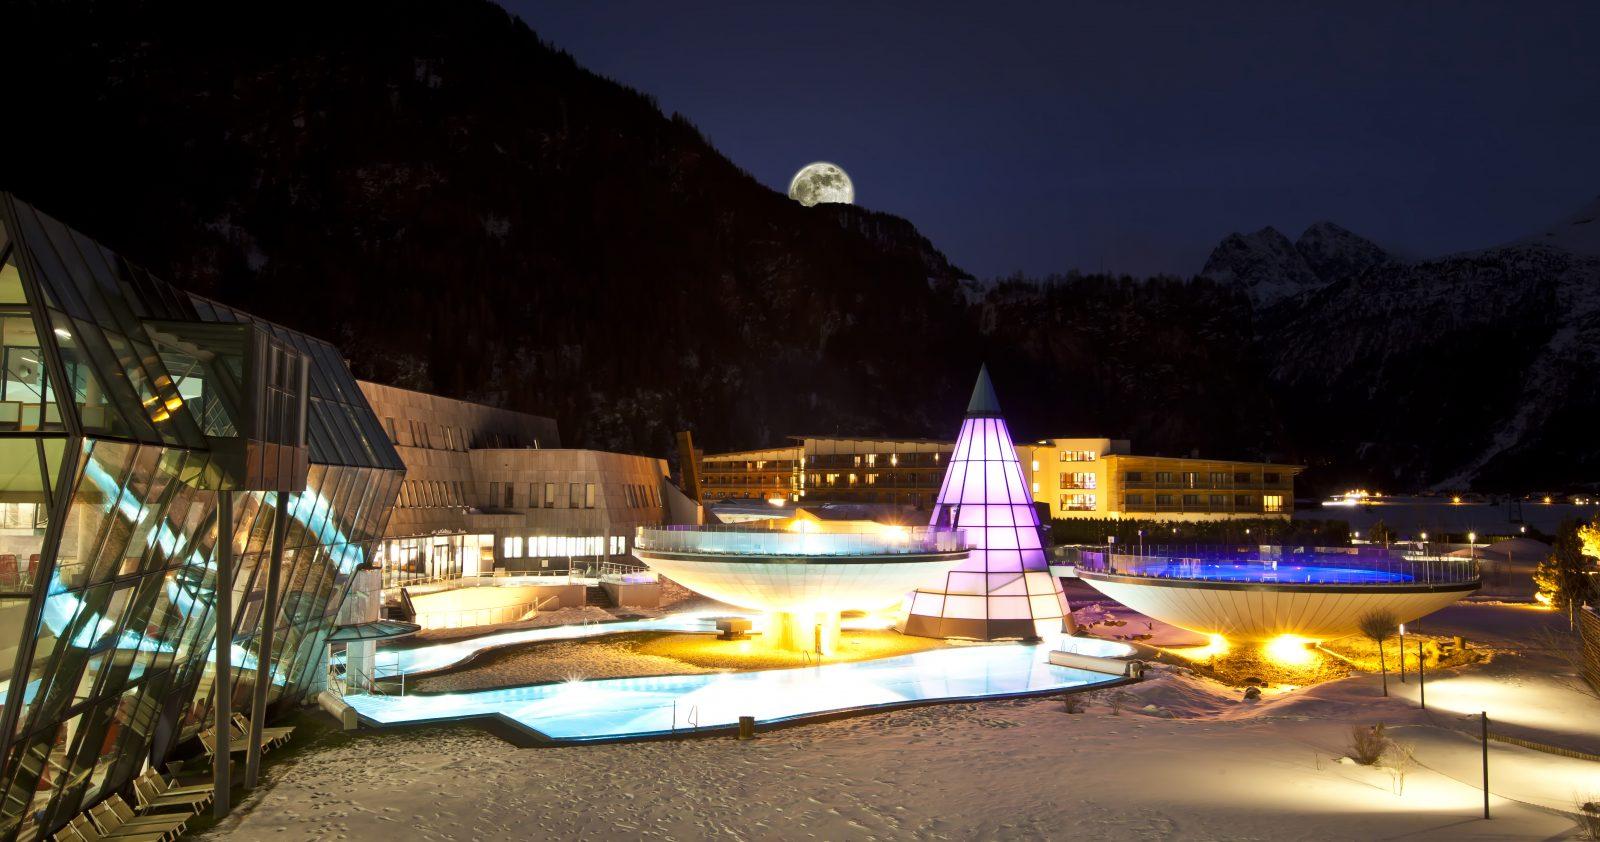 Aqua Dome am Abend, Foto: Aqua Dome | Climbers Paradise